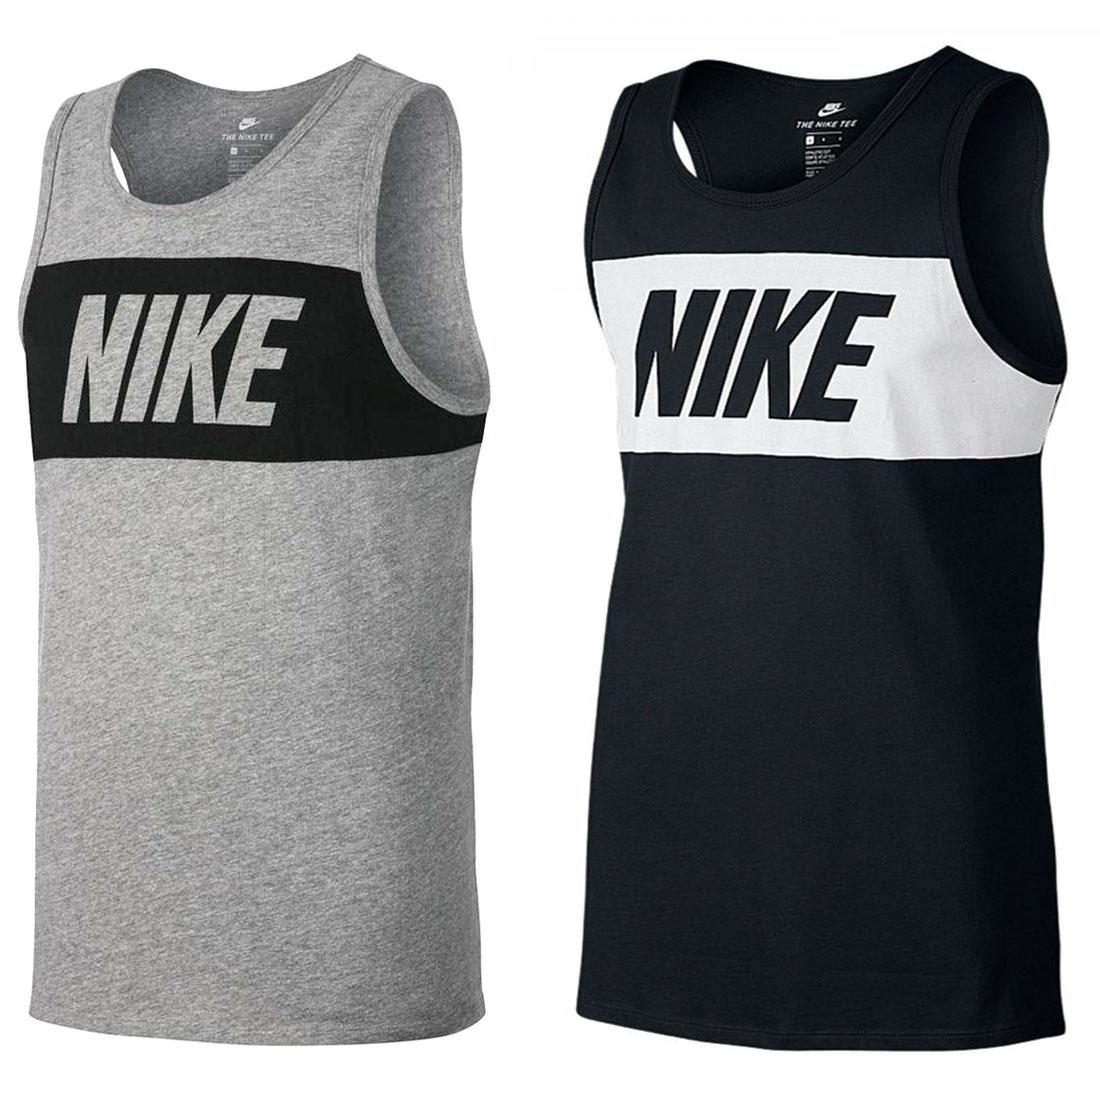 7a24467c6f28c3 Details about Nike Mens Grey Black Vest Retro Big Logo Sports Gym Sleeveless  Tank Top L XL